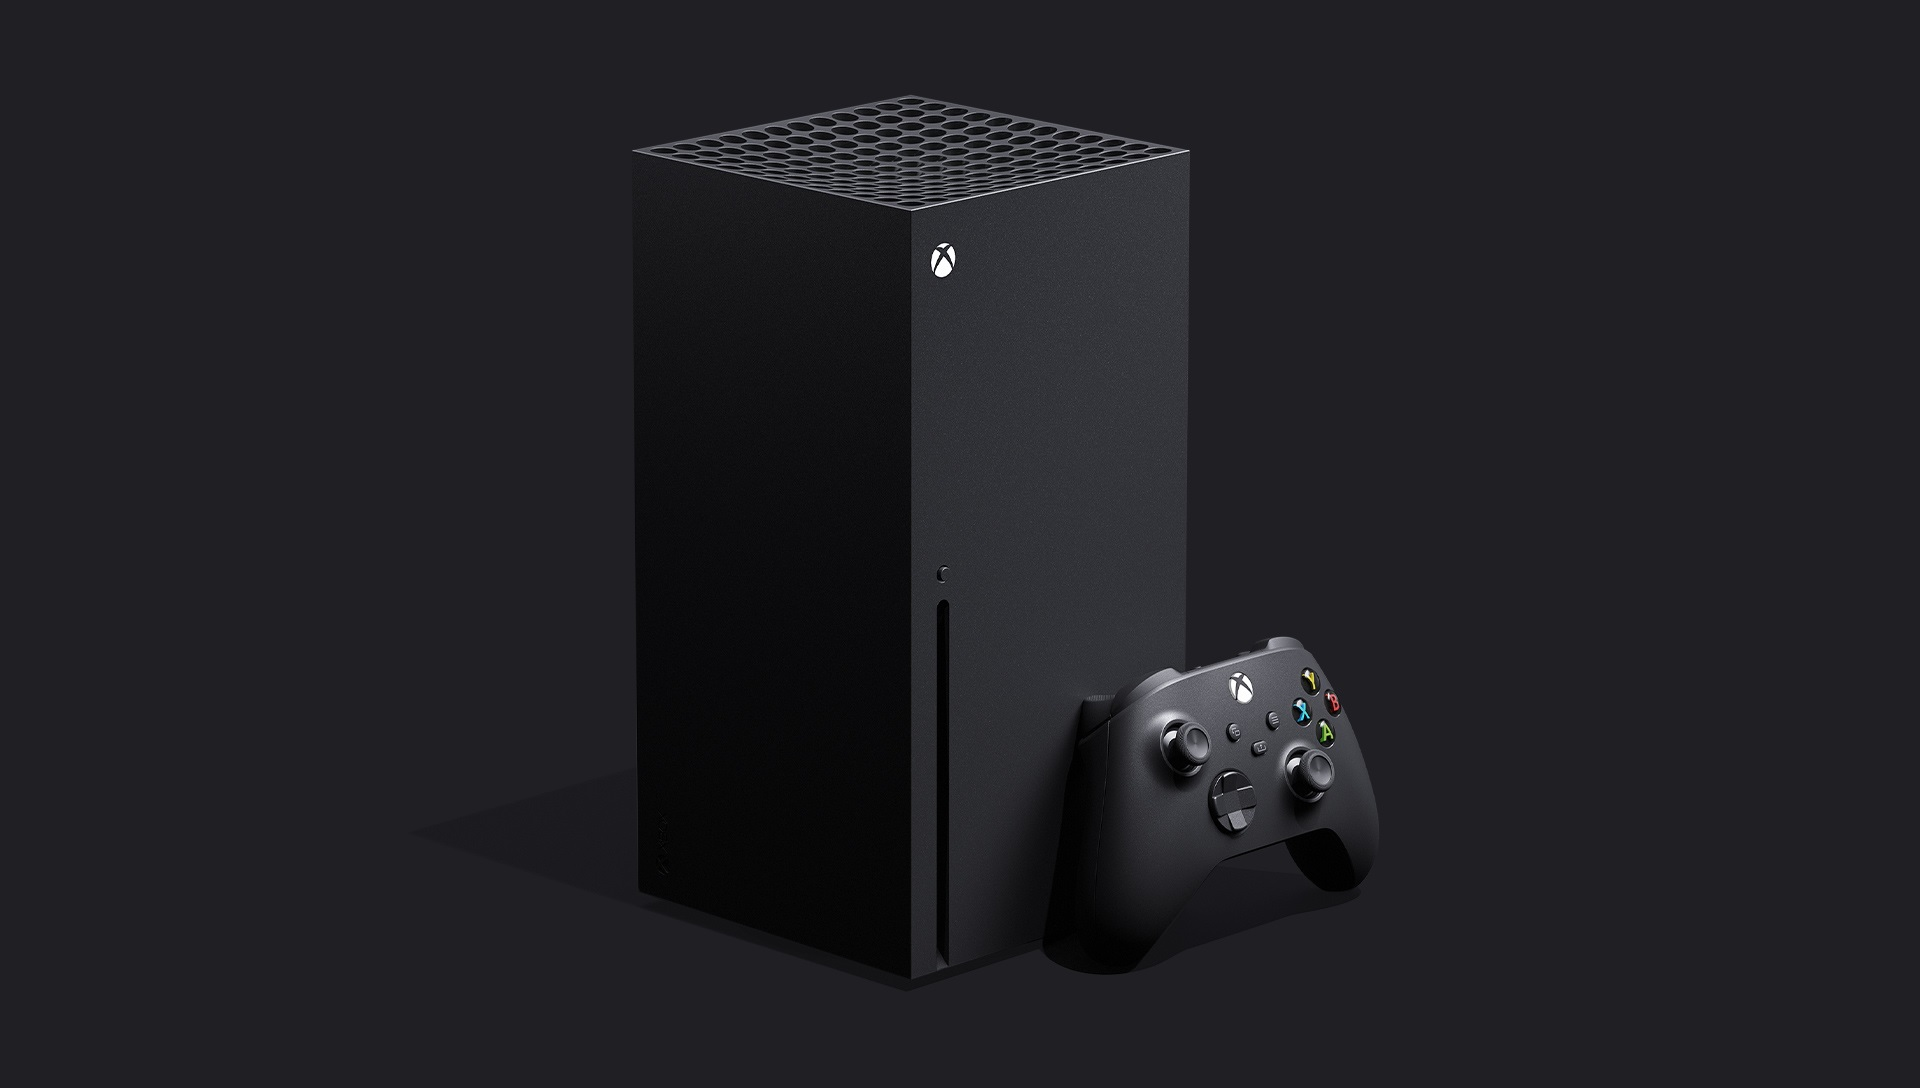 Series X price Xbox consoles Xbox Series X release date xbox series x Xbox cross-gen